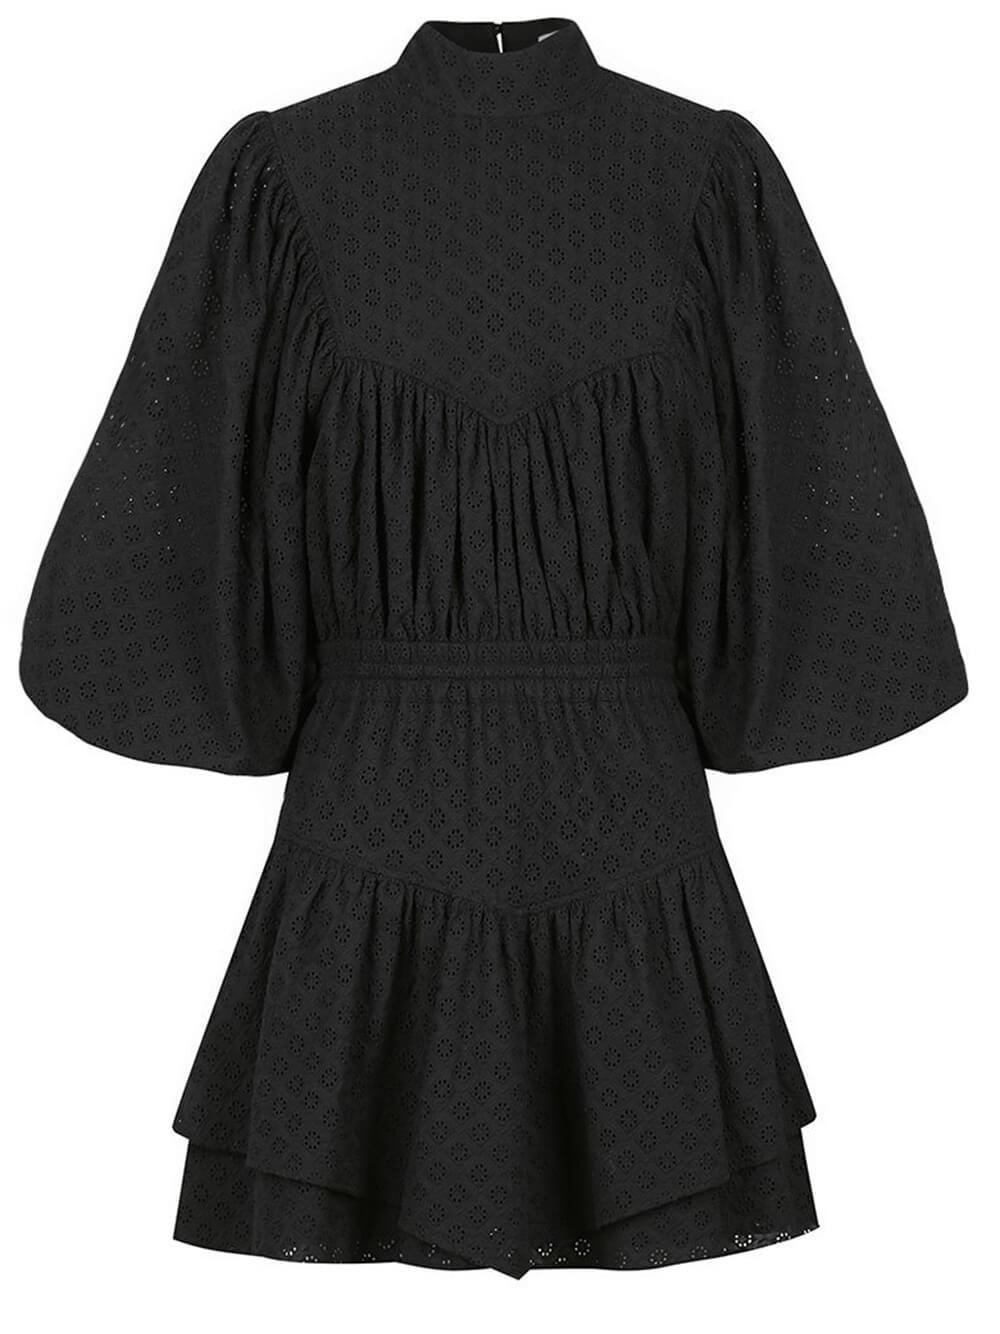 Poppy Mini Dress Item # 212044